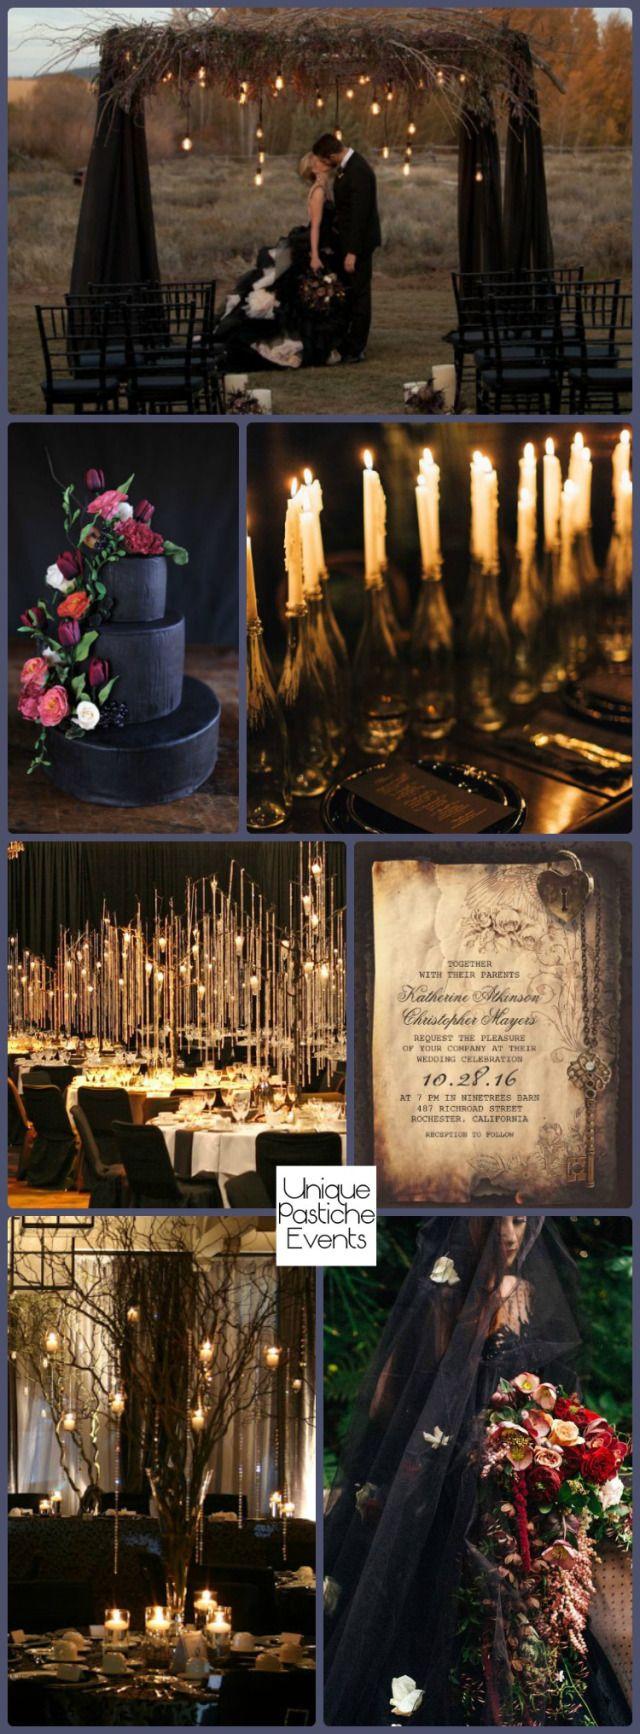 Rustic Goth Wedding by Candlelight Halloween Wedding Ideas #IdeaBoard #InspirationBoard